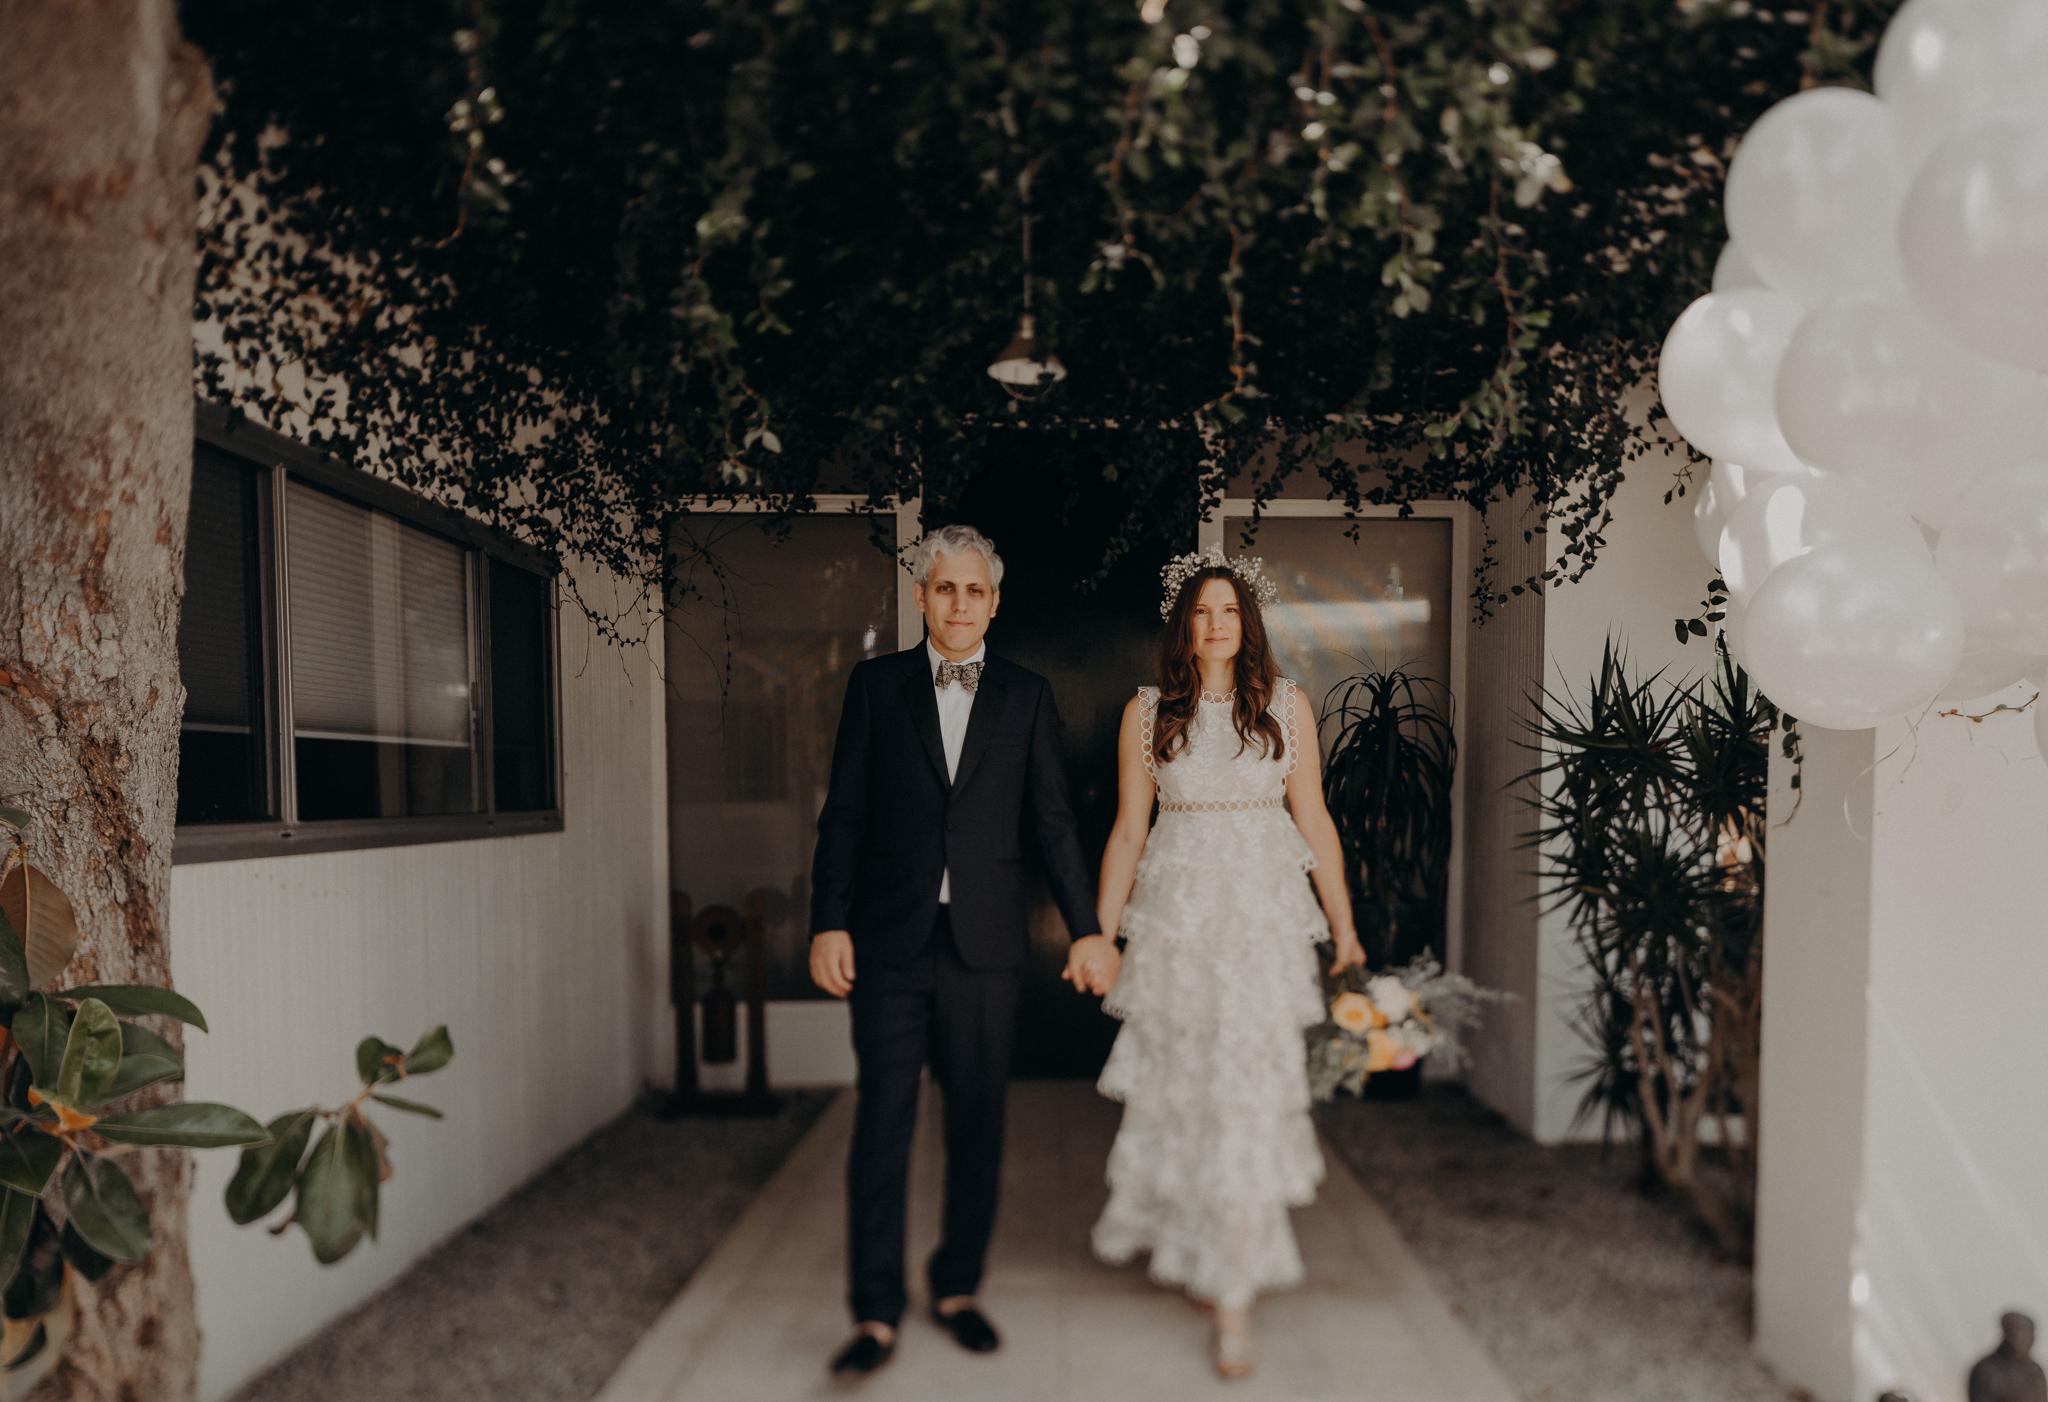 Isaiah + Taylor Photography - Private Estate Backyard Wedding - Beverly Hills - Los Angeles Wedding Photographer - 21.jpg